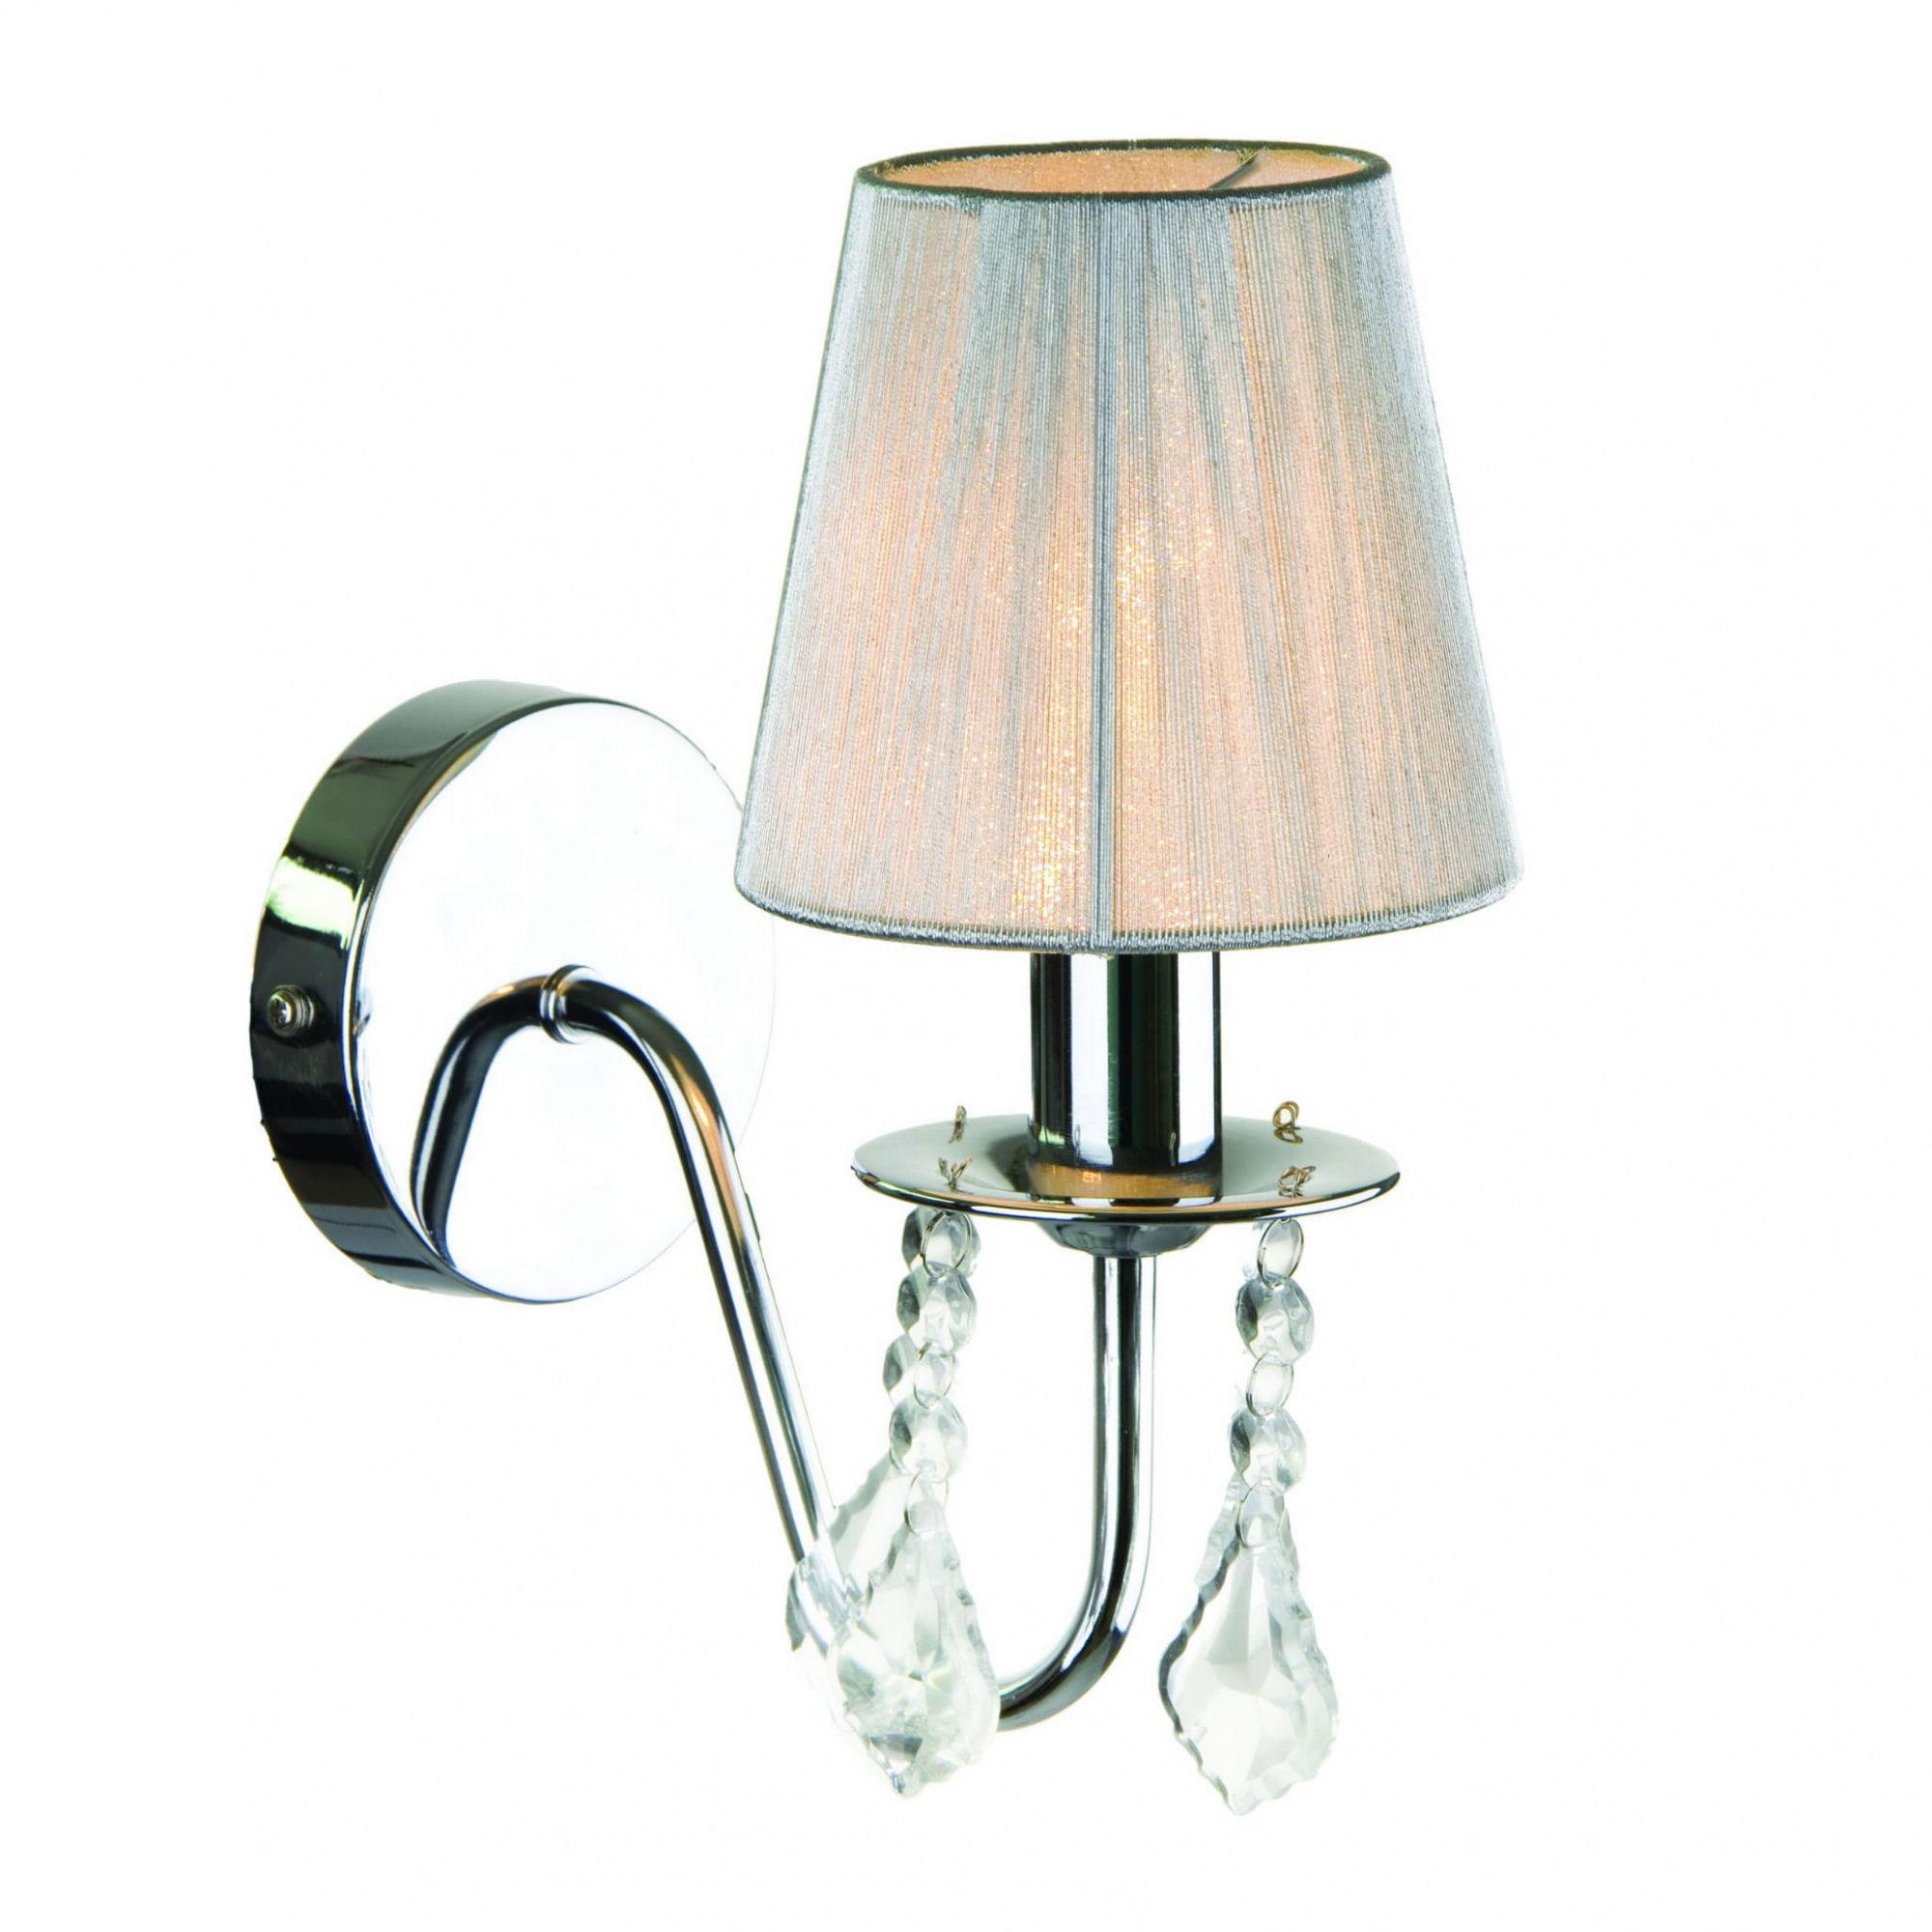 Kinkiet Mona P-5005/1W Light Prestige elegancka lampa ścienna w kolorze srebrnym